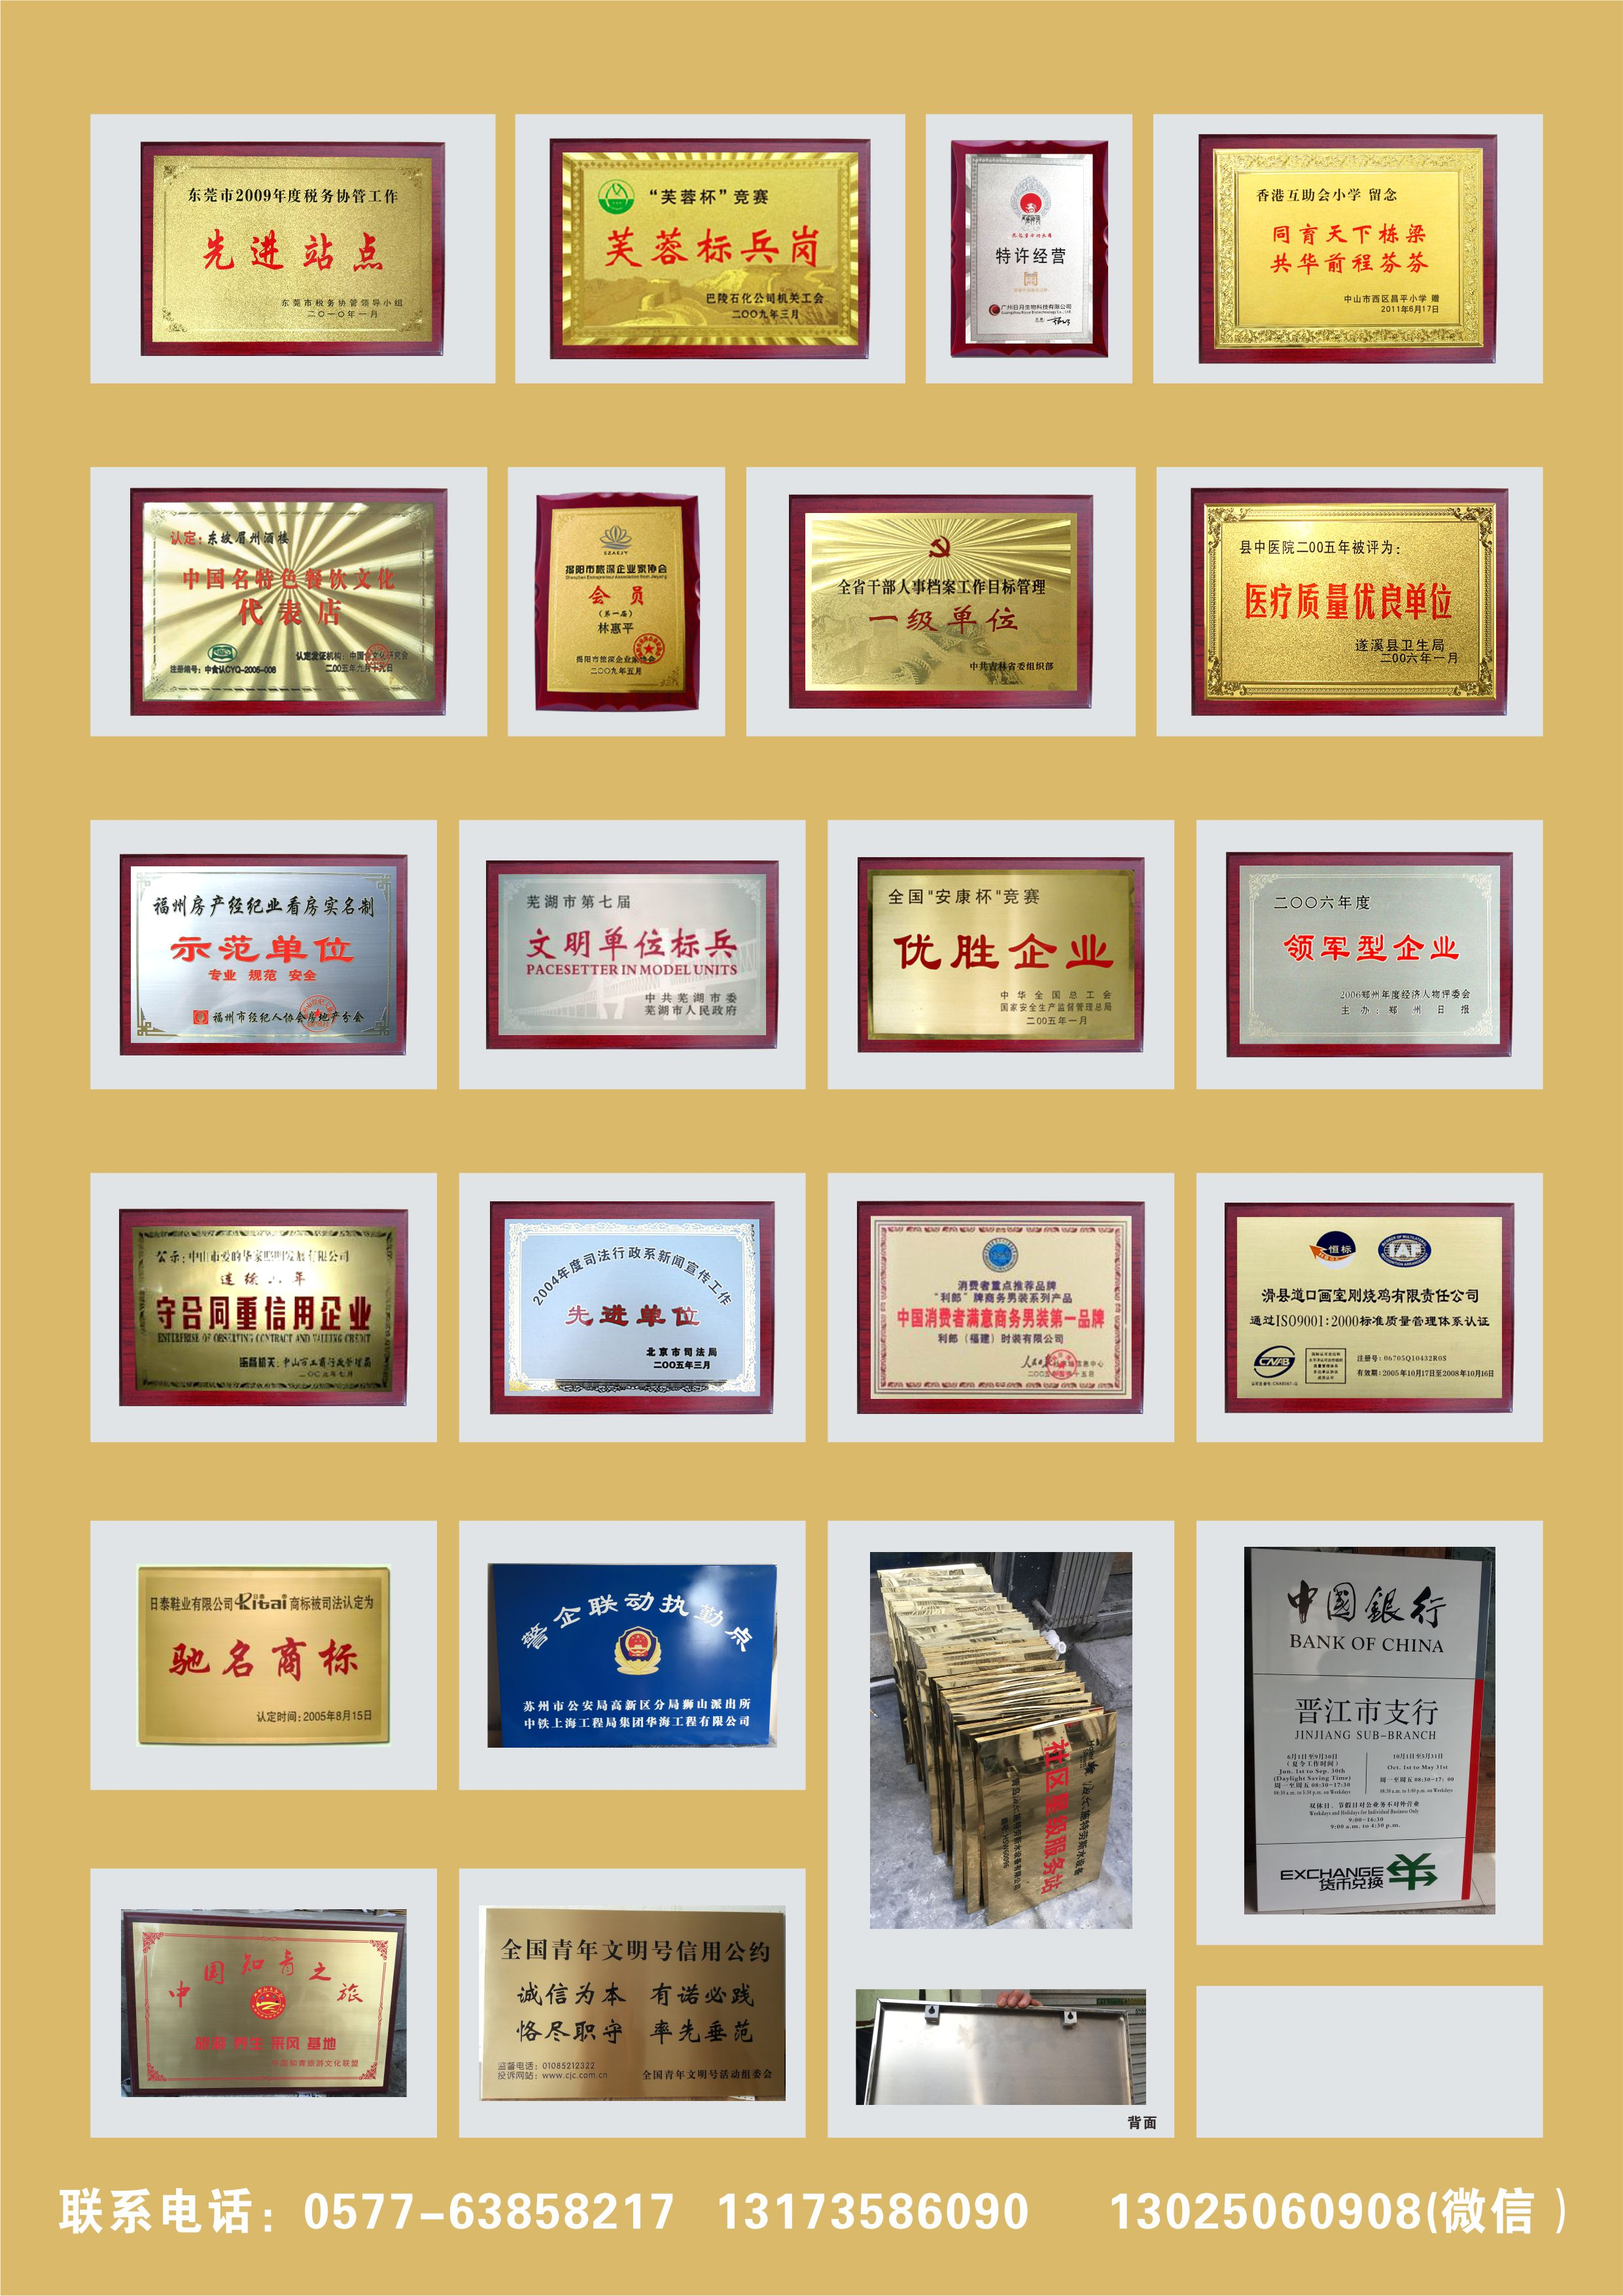 Die medaille Gold stapel karten Gold - Korrosion marke edelstahlplatten Titan Gold und Bronze medaille Sand